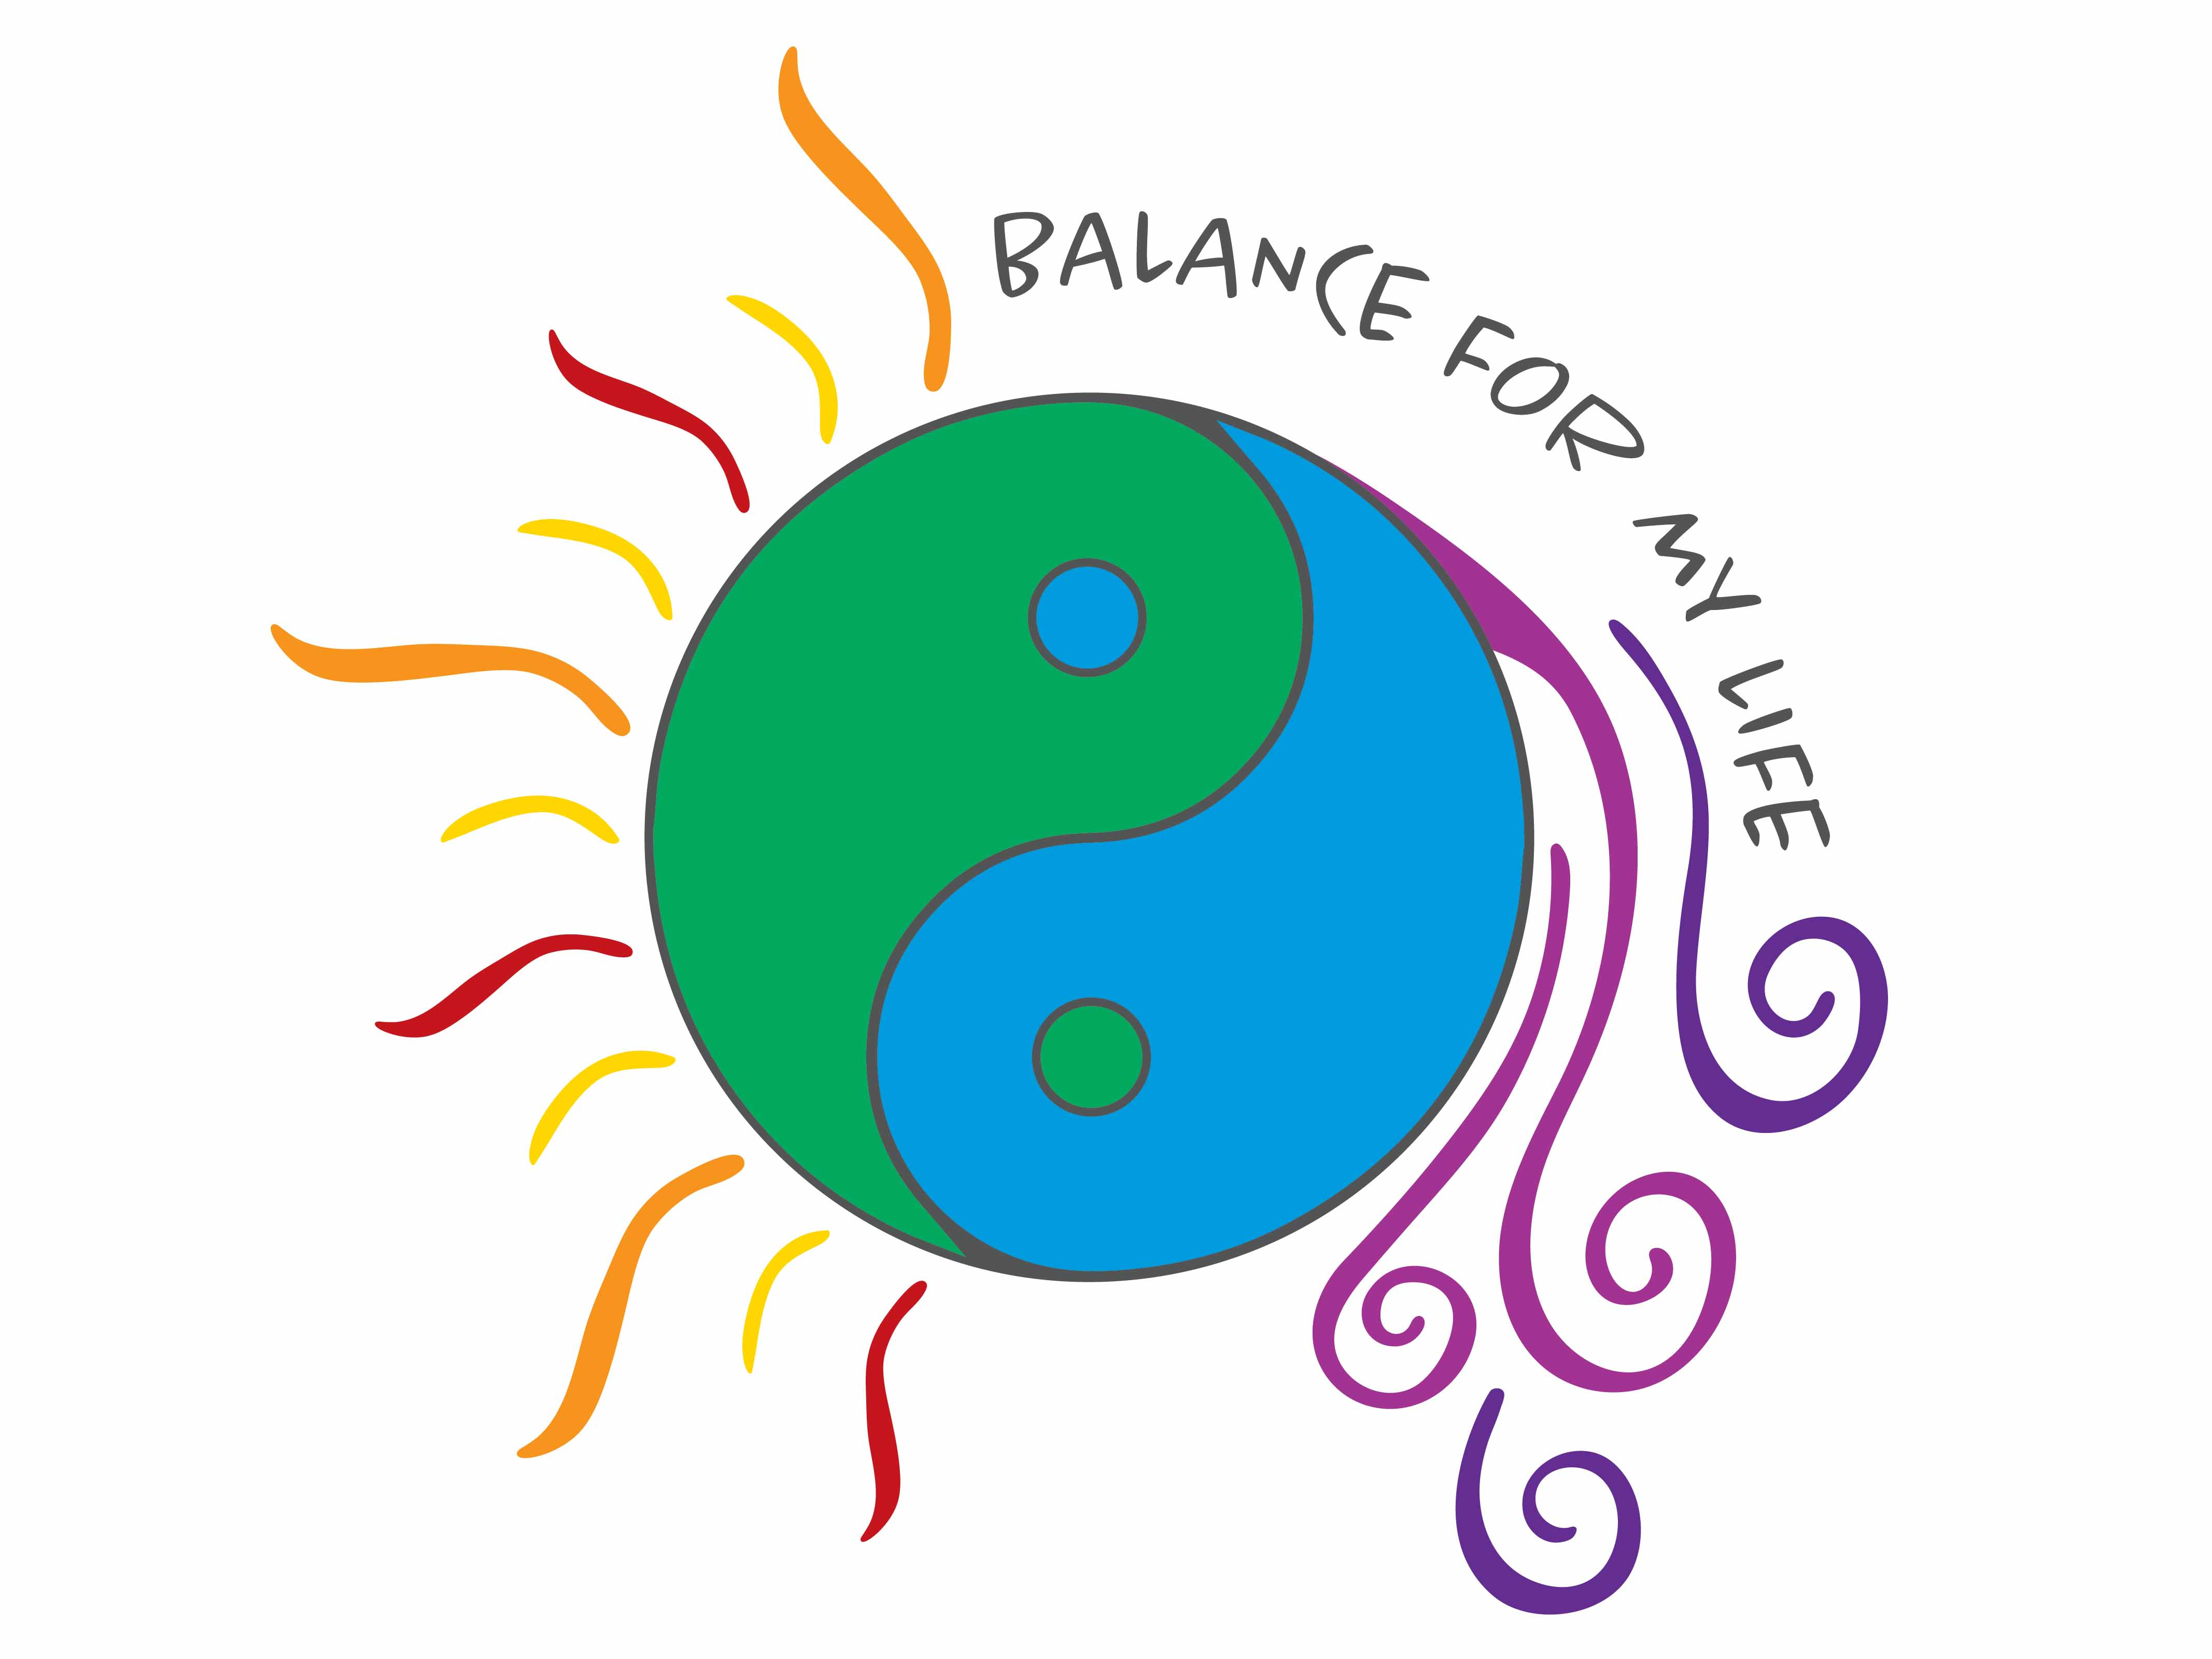 Balance For My Life